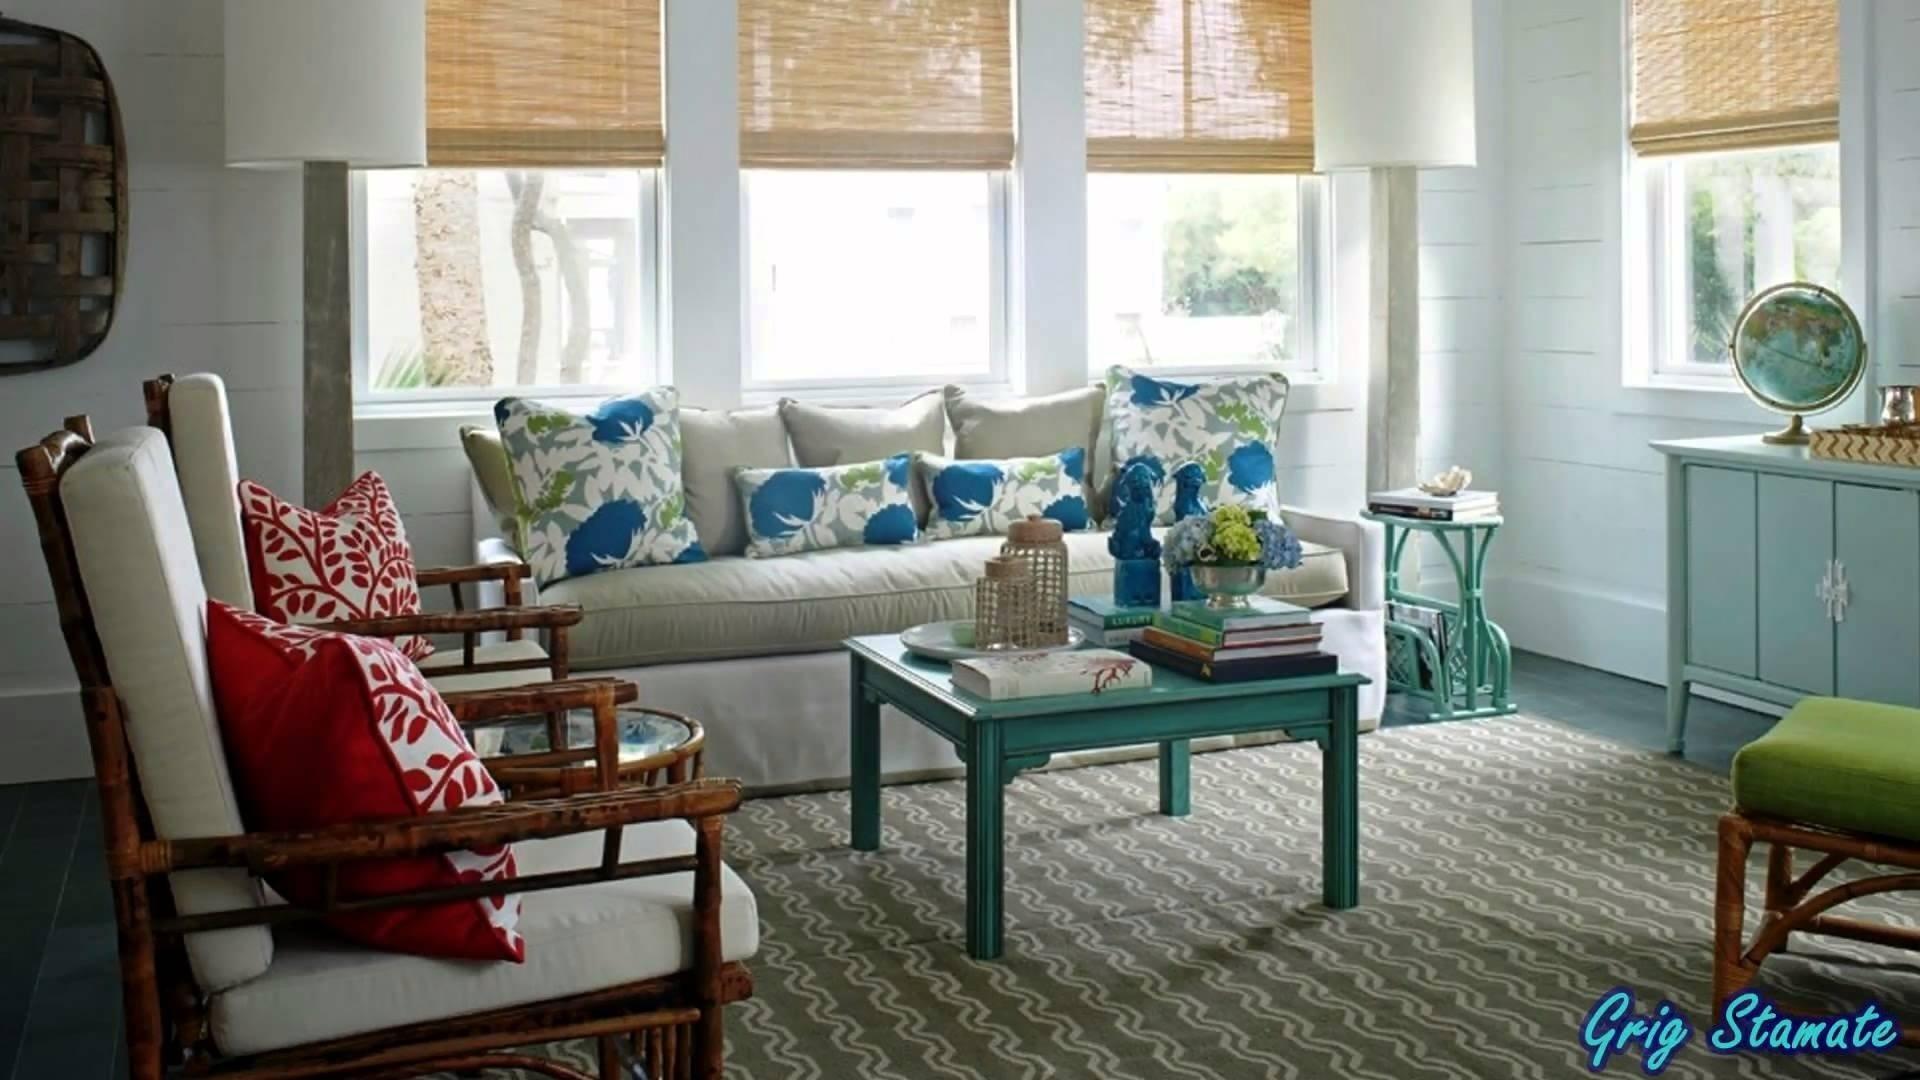 10 Stylish Living Room Ideas On A Budget living rooms on a budget living room decorating ideas youtube 1